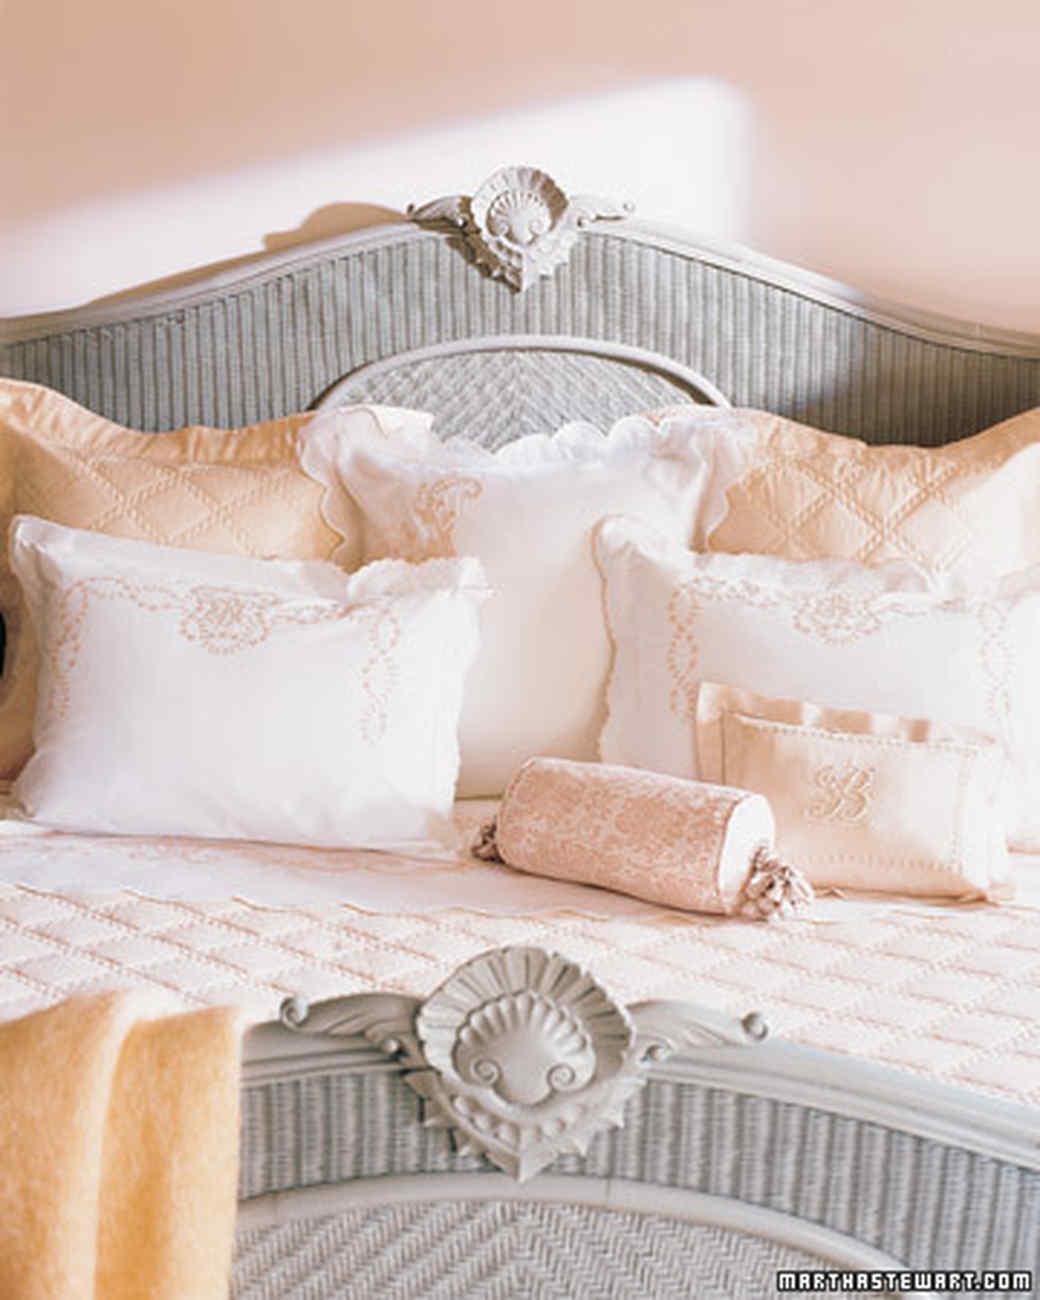 Skylands Guesthouse Martha Stewart